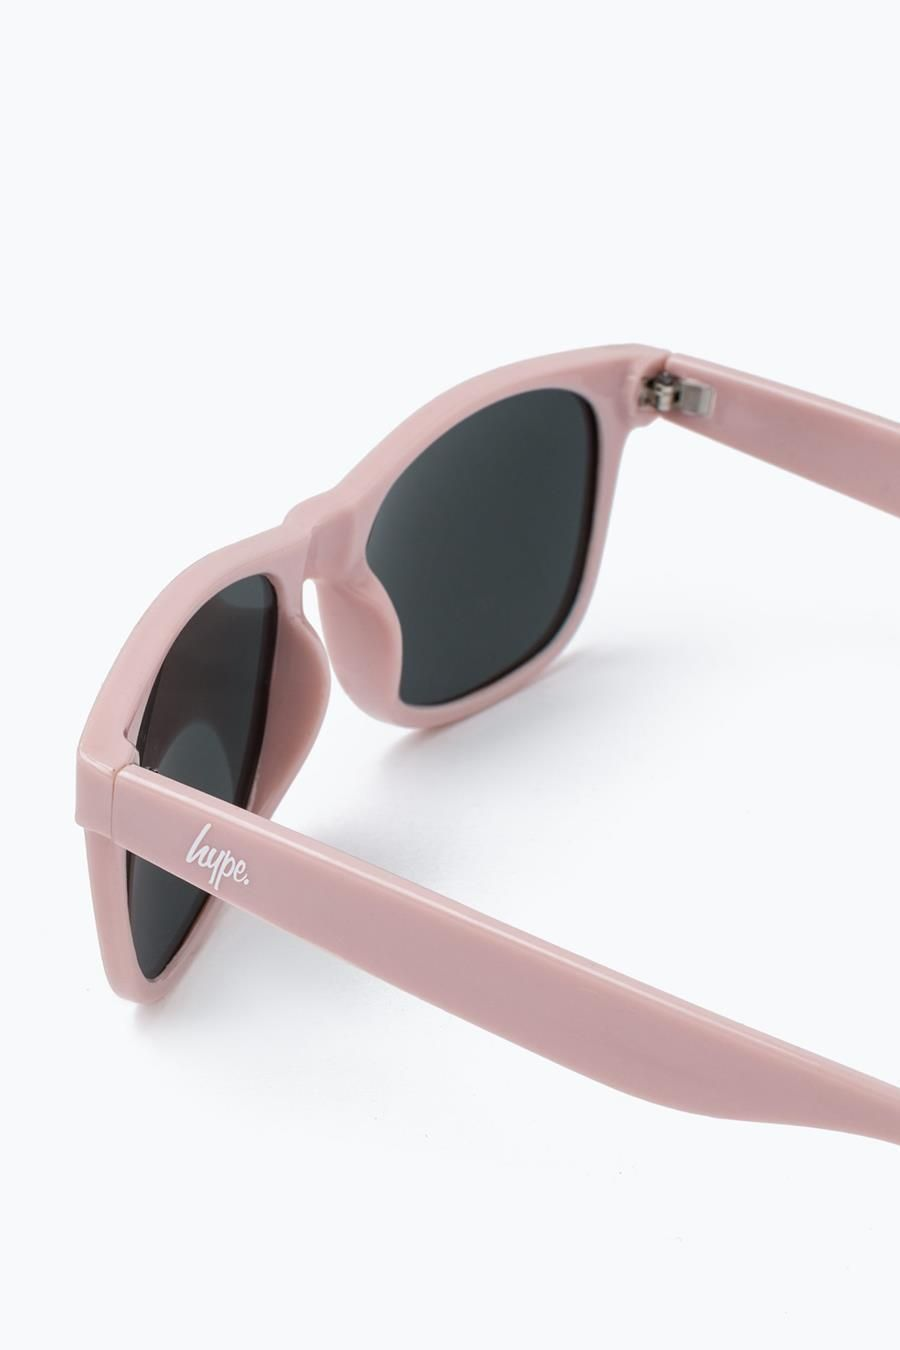 Hype Pink Pastel Sunglasses